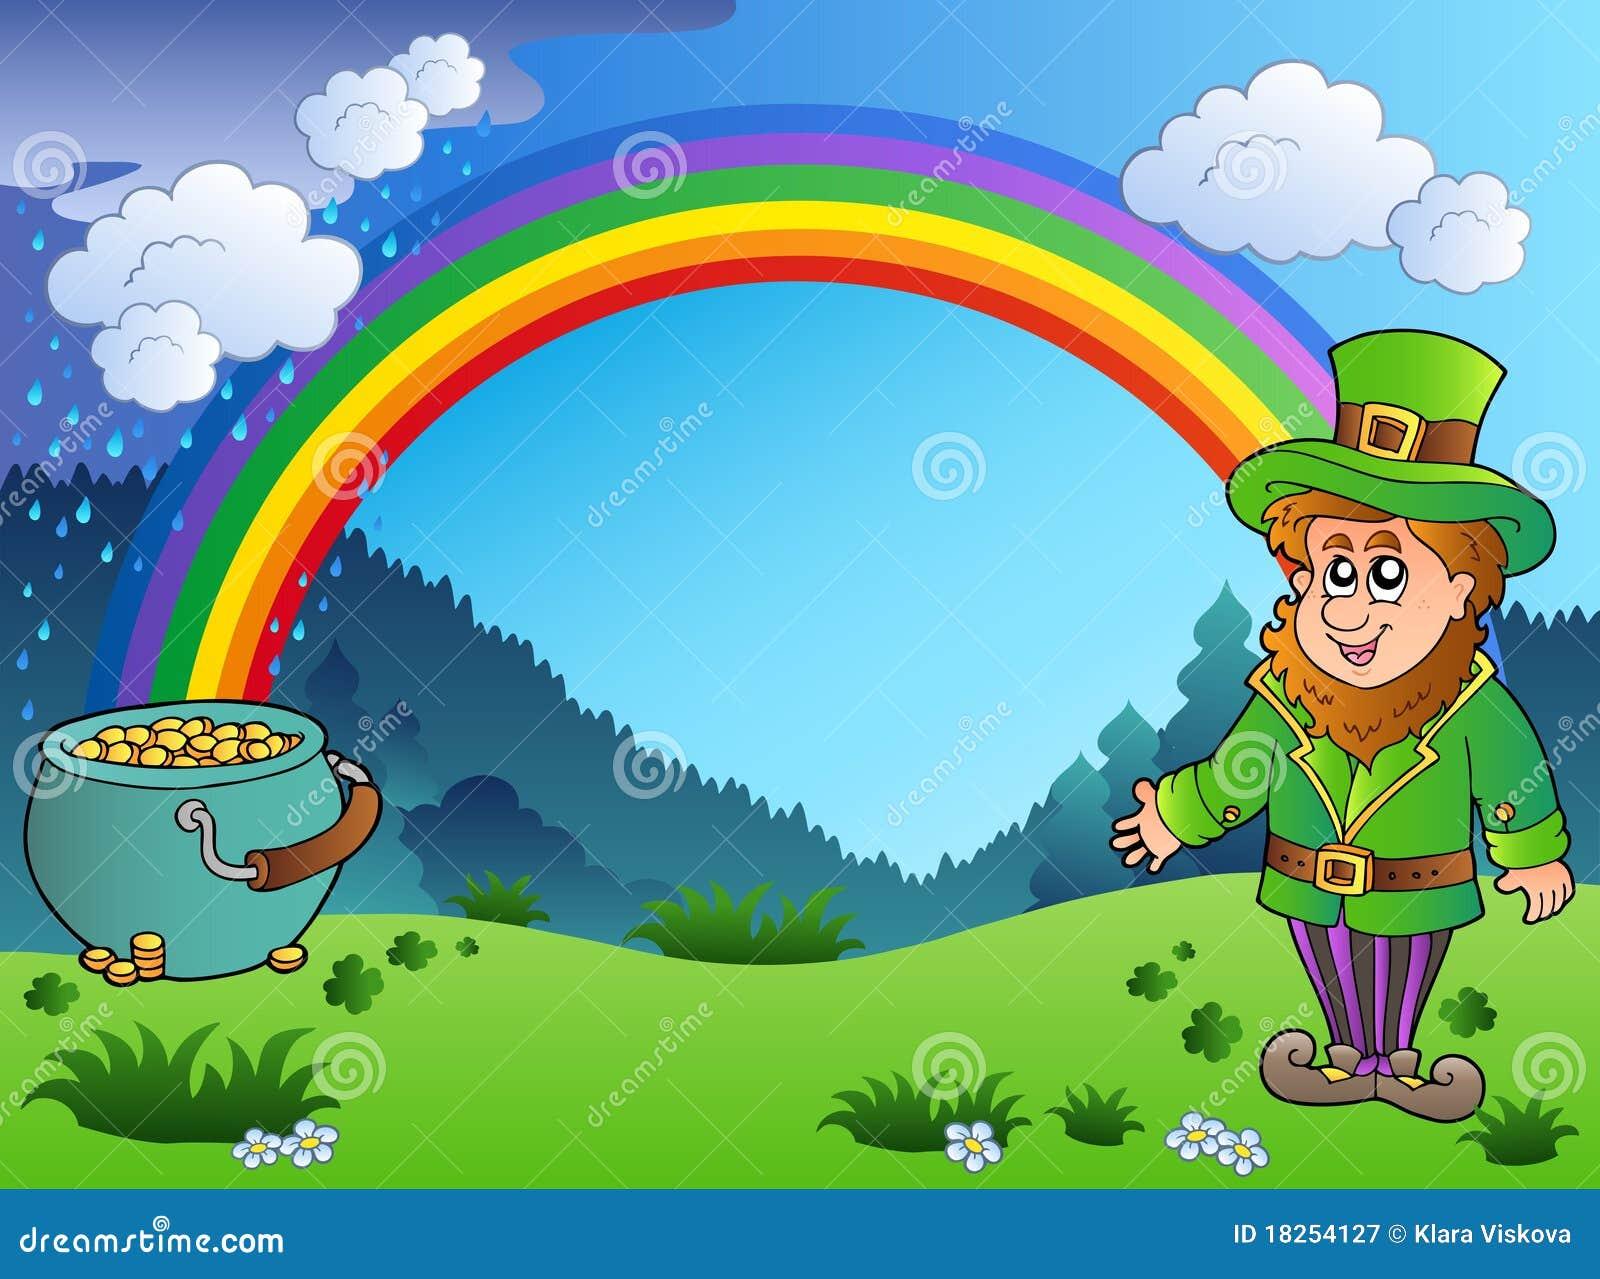 Uncategorized Leprechauns And Rainbows meadow with rainbow and leprechaun royalty free stock photography photo download leprechaun